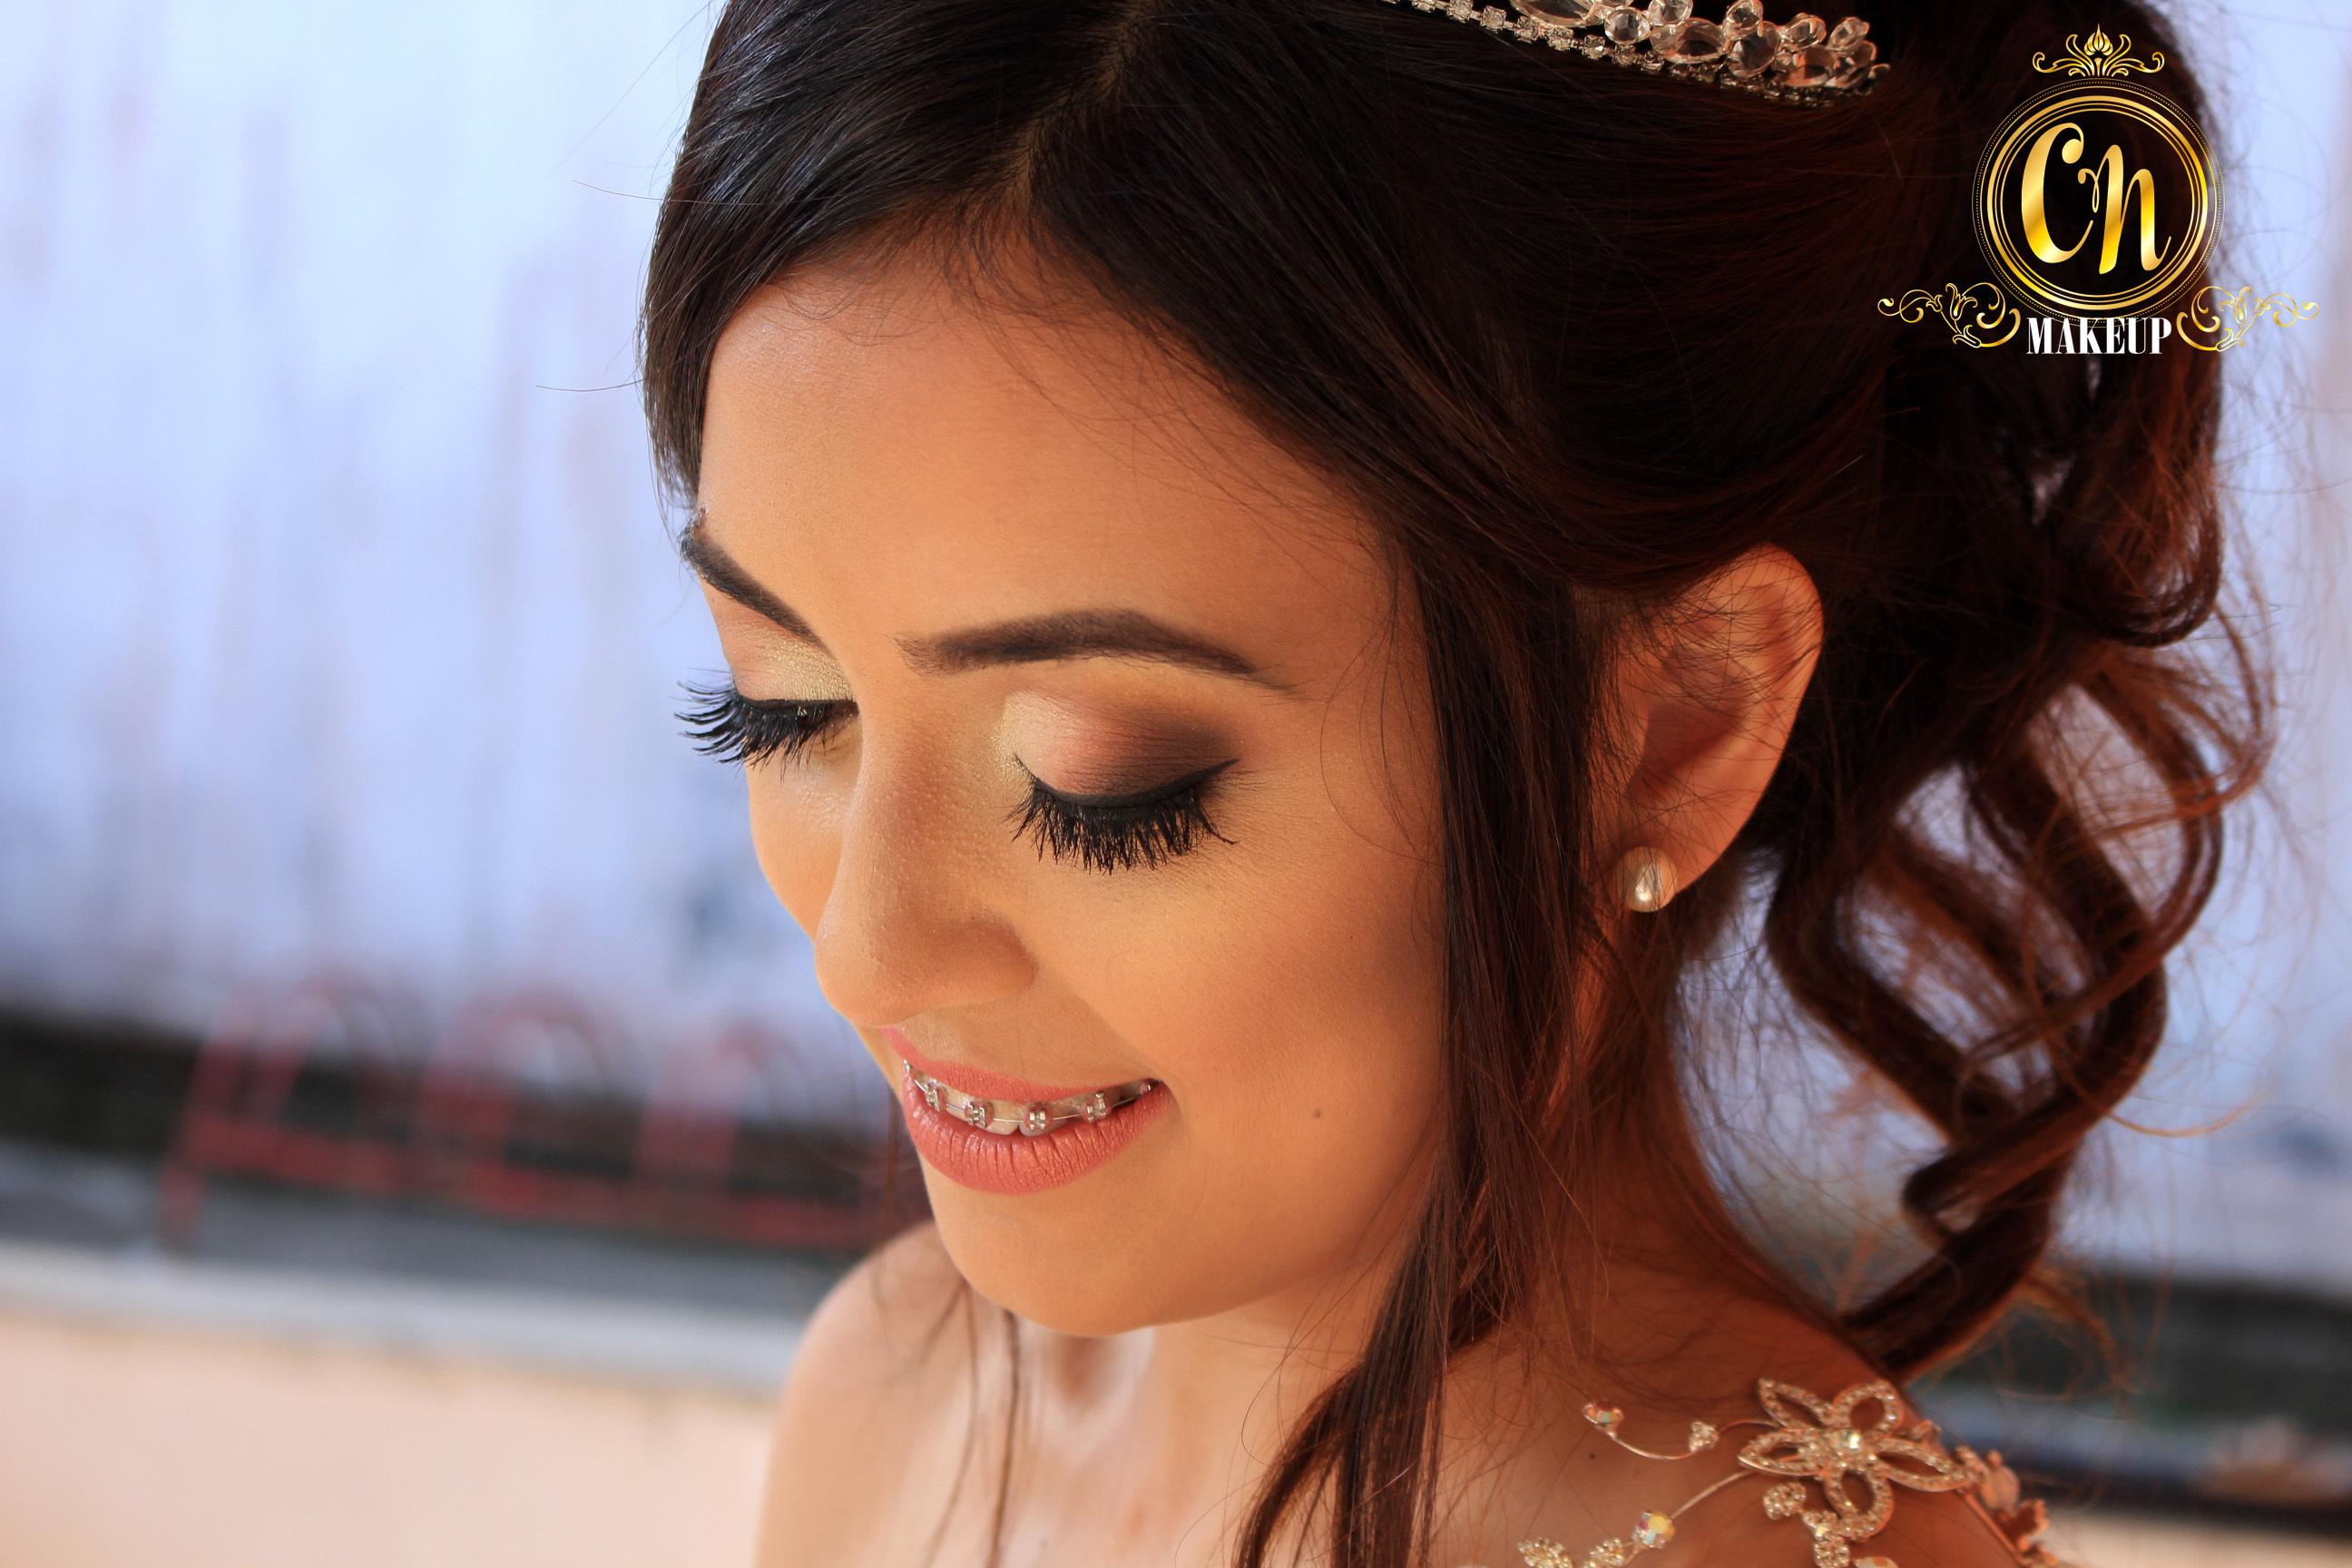 Noiva lindinha ♥ . #maquiagemlitoral #maquiadoraubatuba #mua #maquiagemubatuba #maquiagemcaraguatatuba #ubatuba #caraguatatuba #makeupartist #noiva #maquiagemnoiva #bridalmakeup #bridemakeup #neutralmakeup #maquiagemneutra #bride #sephora #marykay #maybelline #catharinehill #tracta #dailus maquiagem maquiador(a)